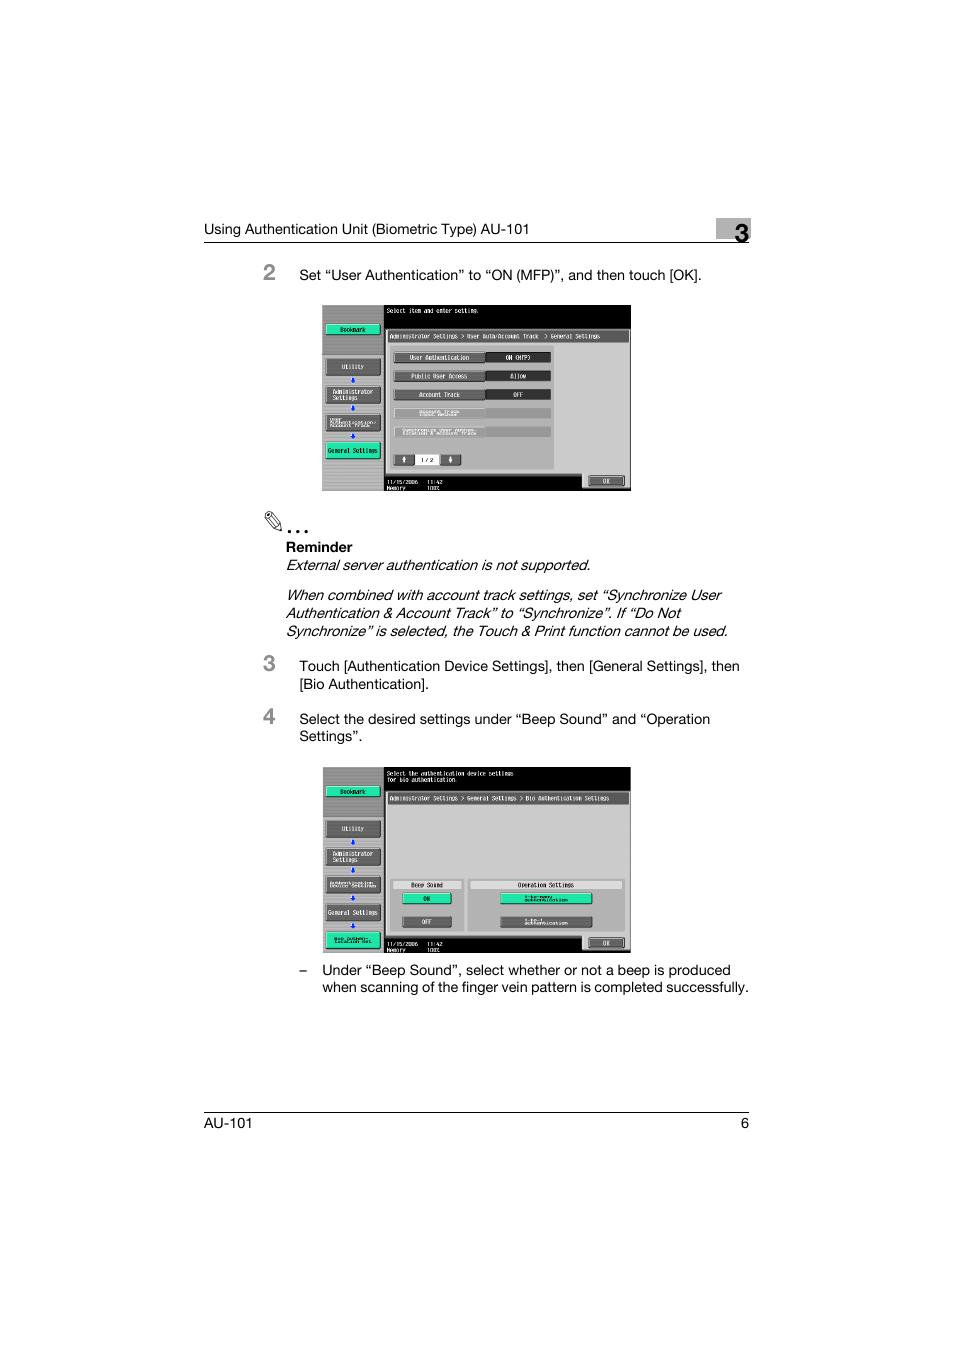 konica minolta bizhub c451 user manual page 7 44 original mode rh manualsdir com Konica Minolta C360 Konica Minolta C454